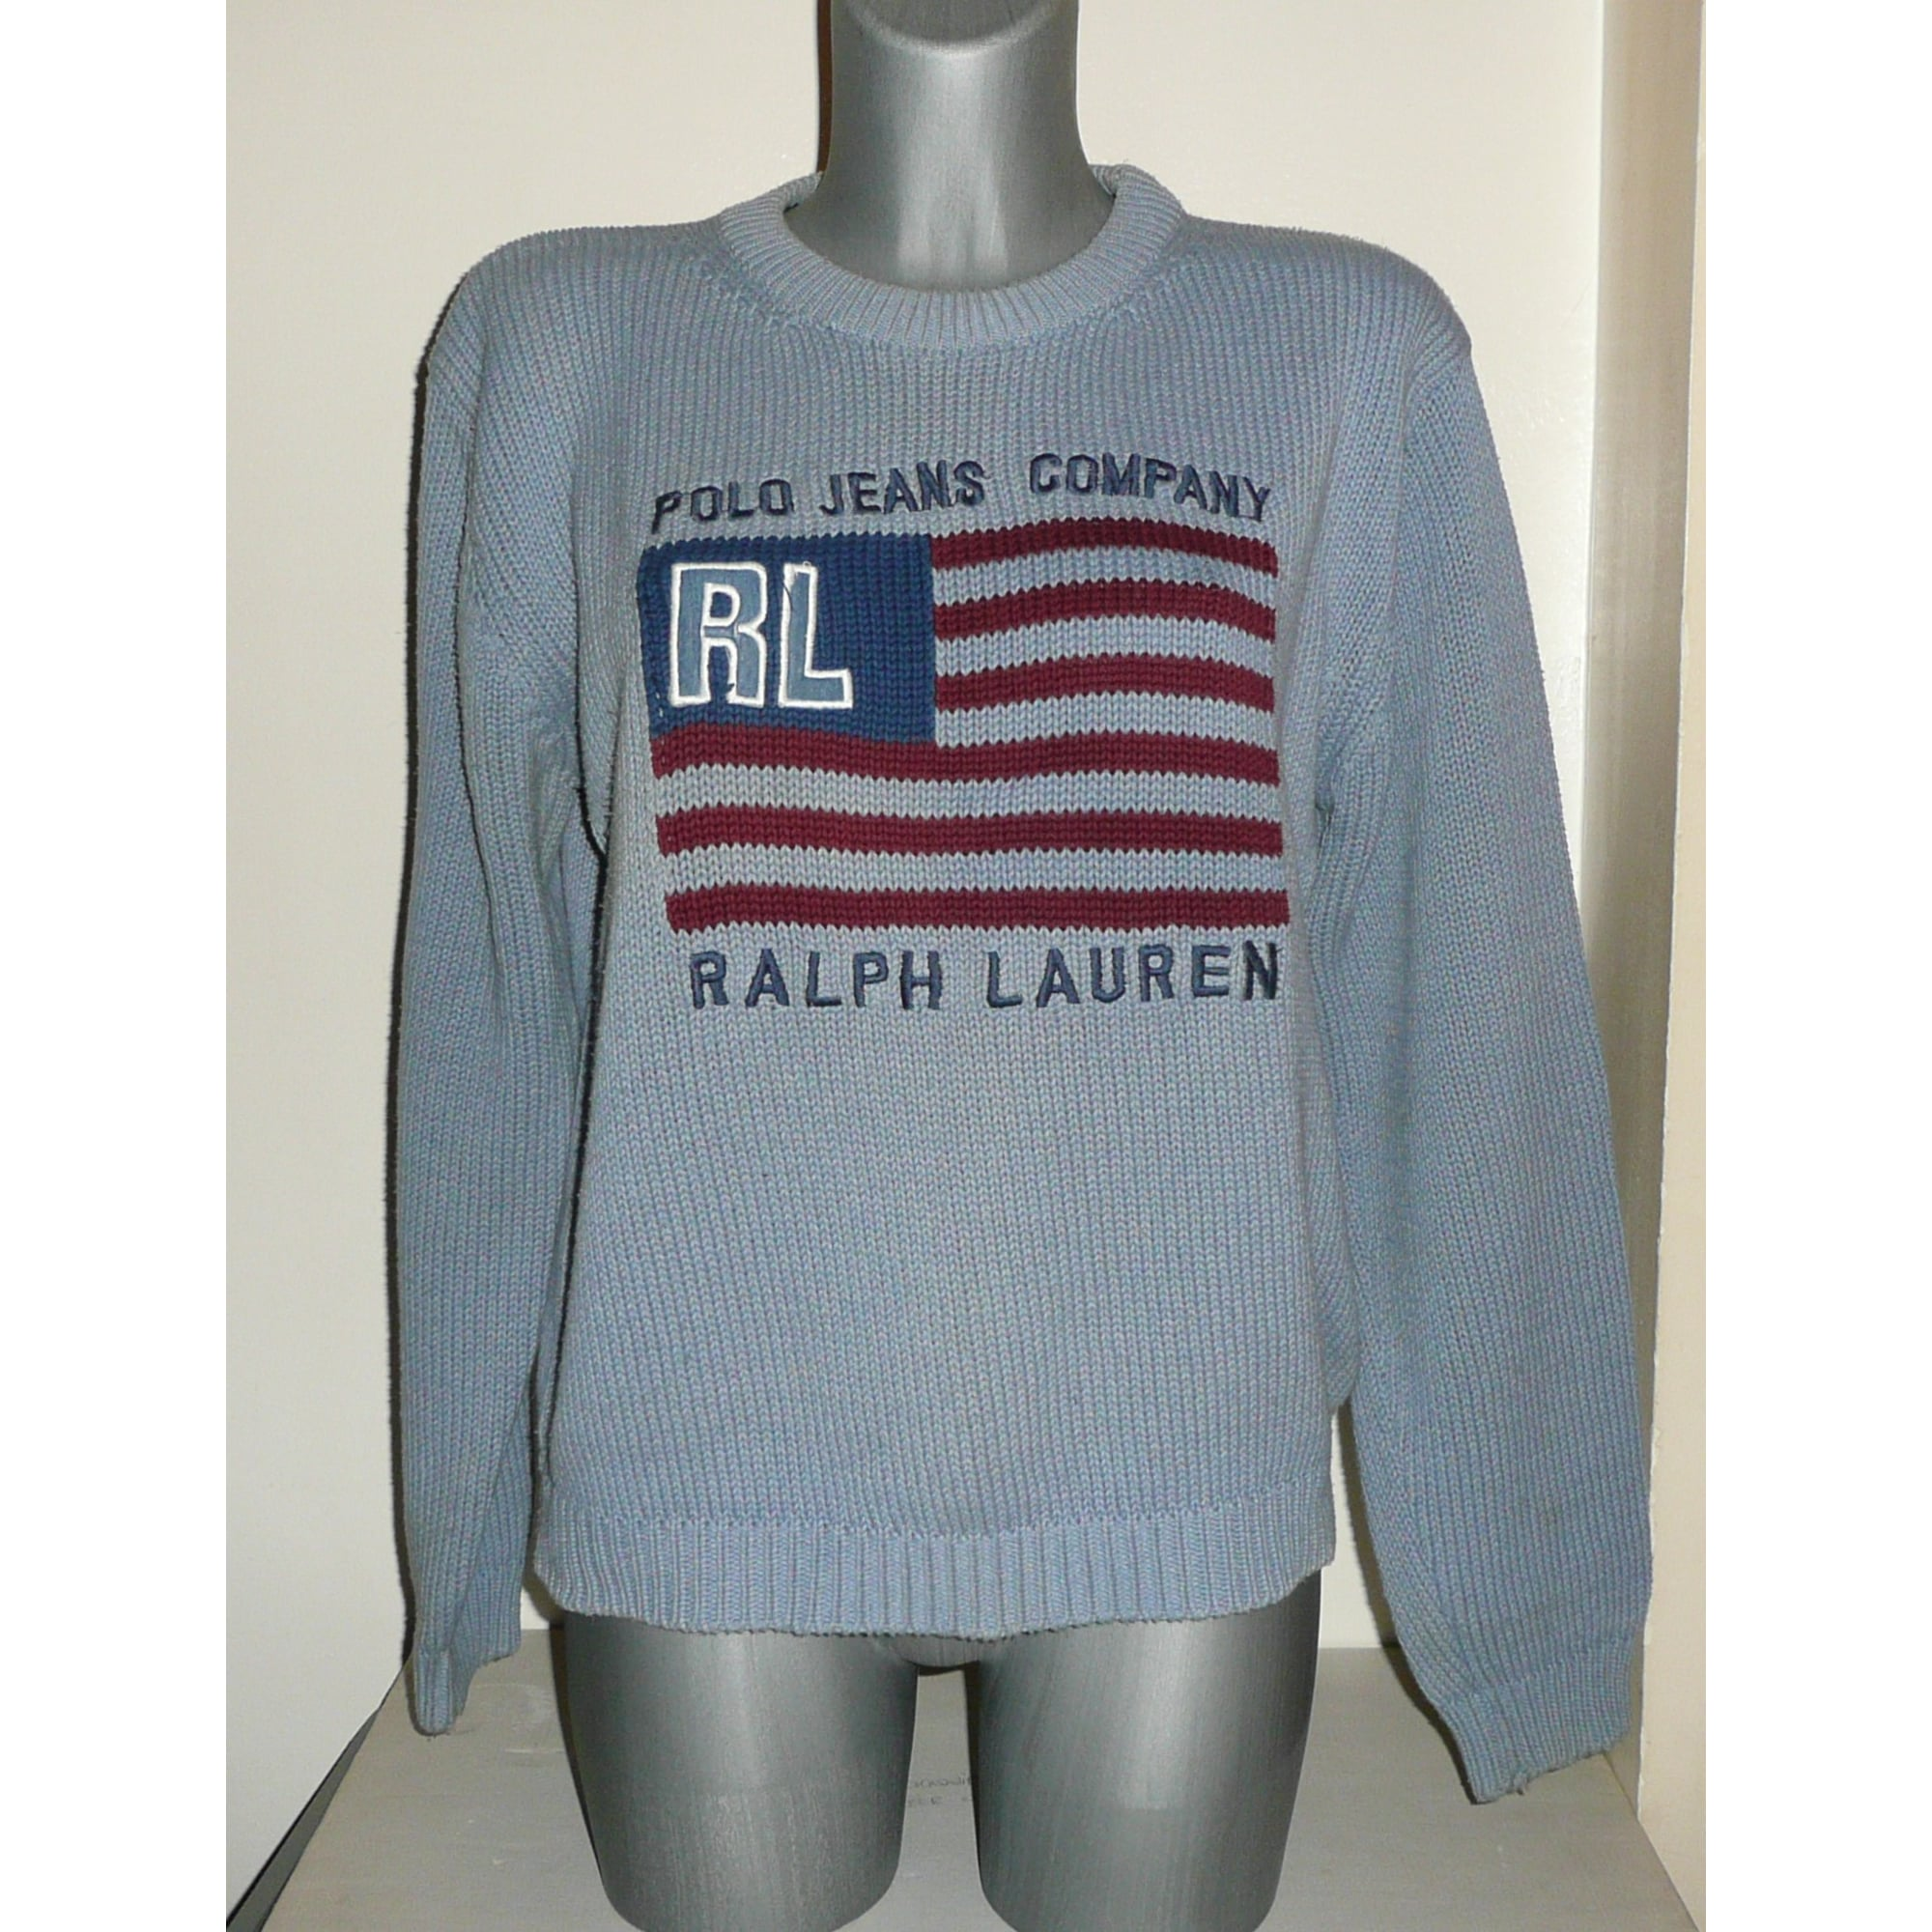 Pull RALPH LAUREN 38 (M, T2) bleu vendu par Sokool - 7295600 2b71c7ab29be